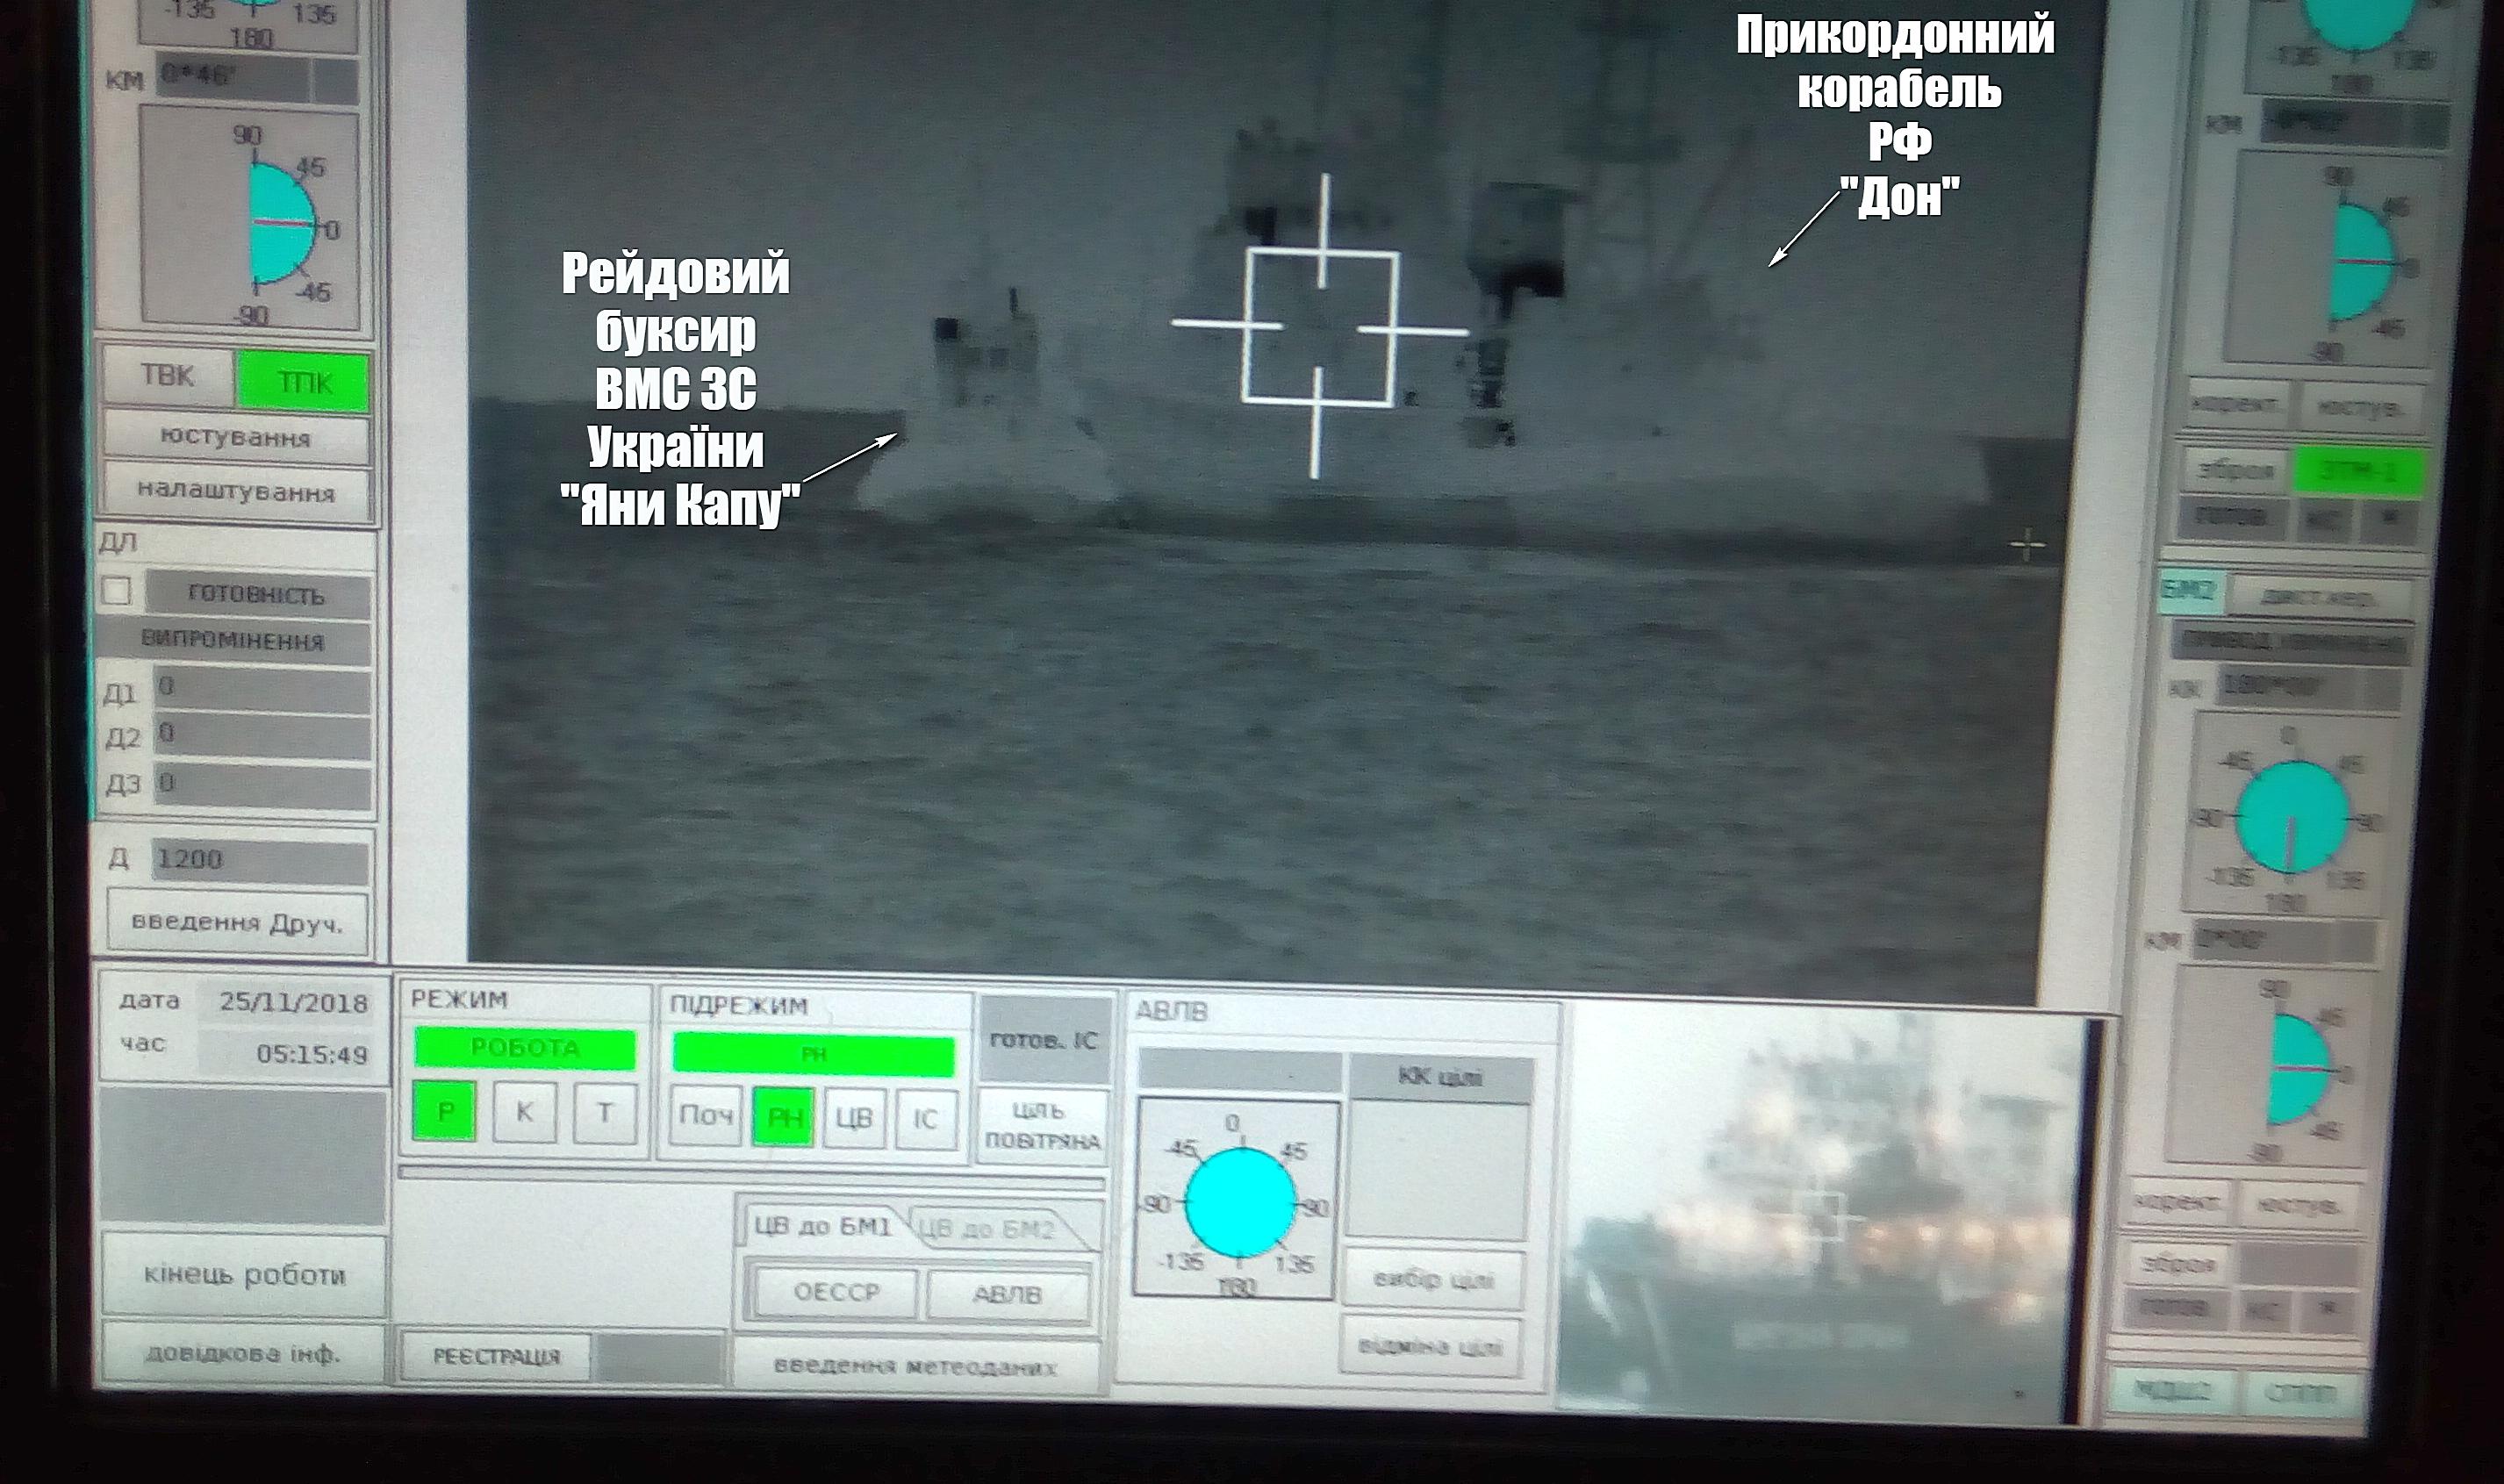 Kerch Strait incident - Wikipedia